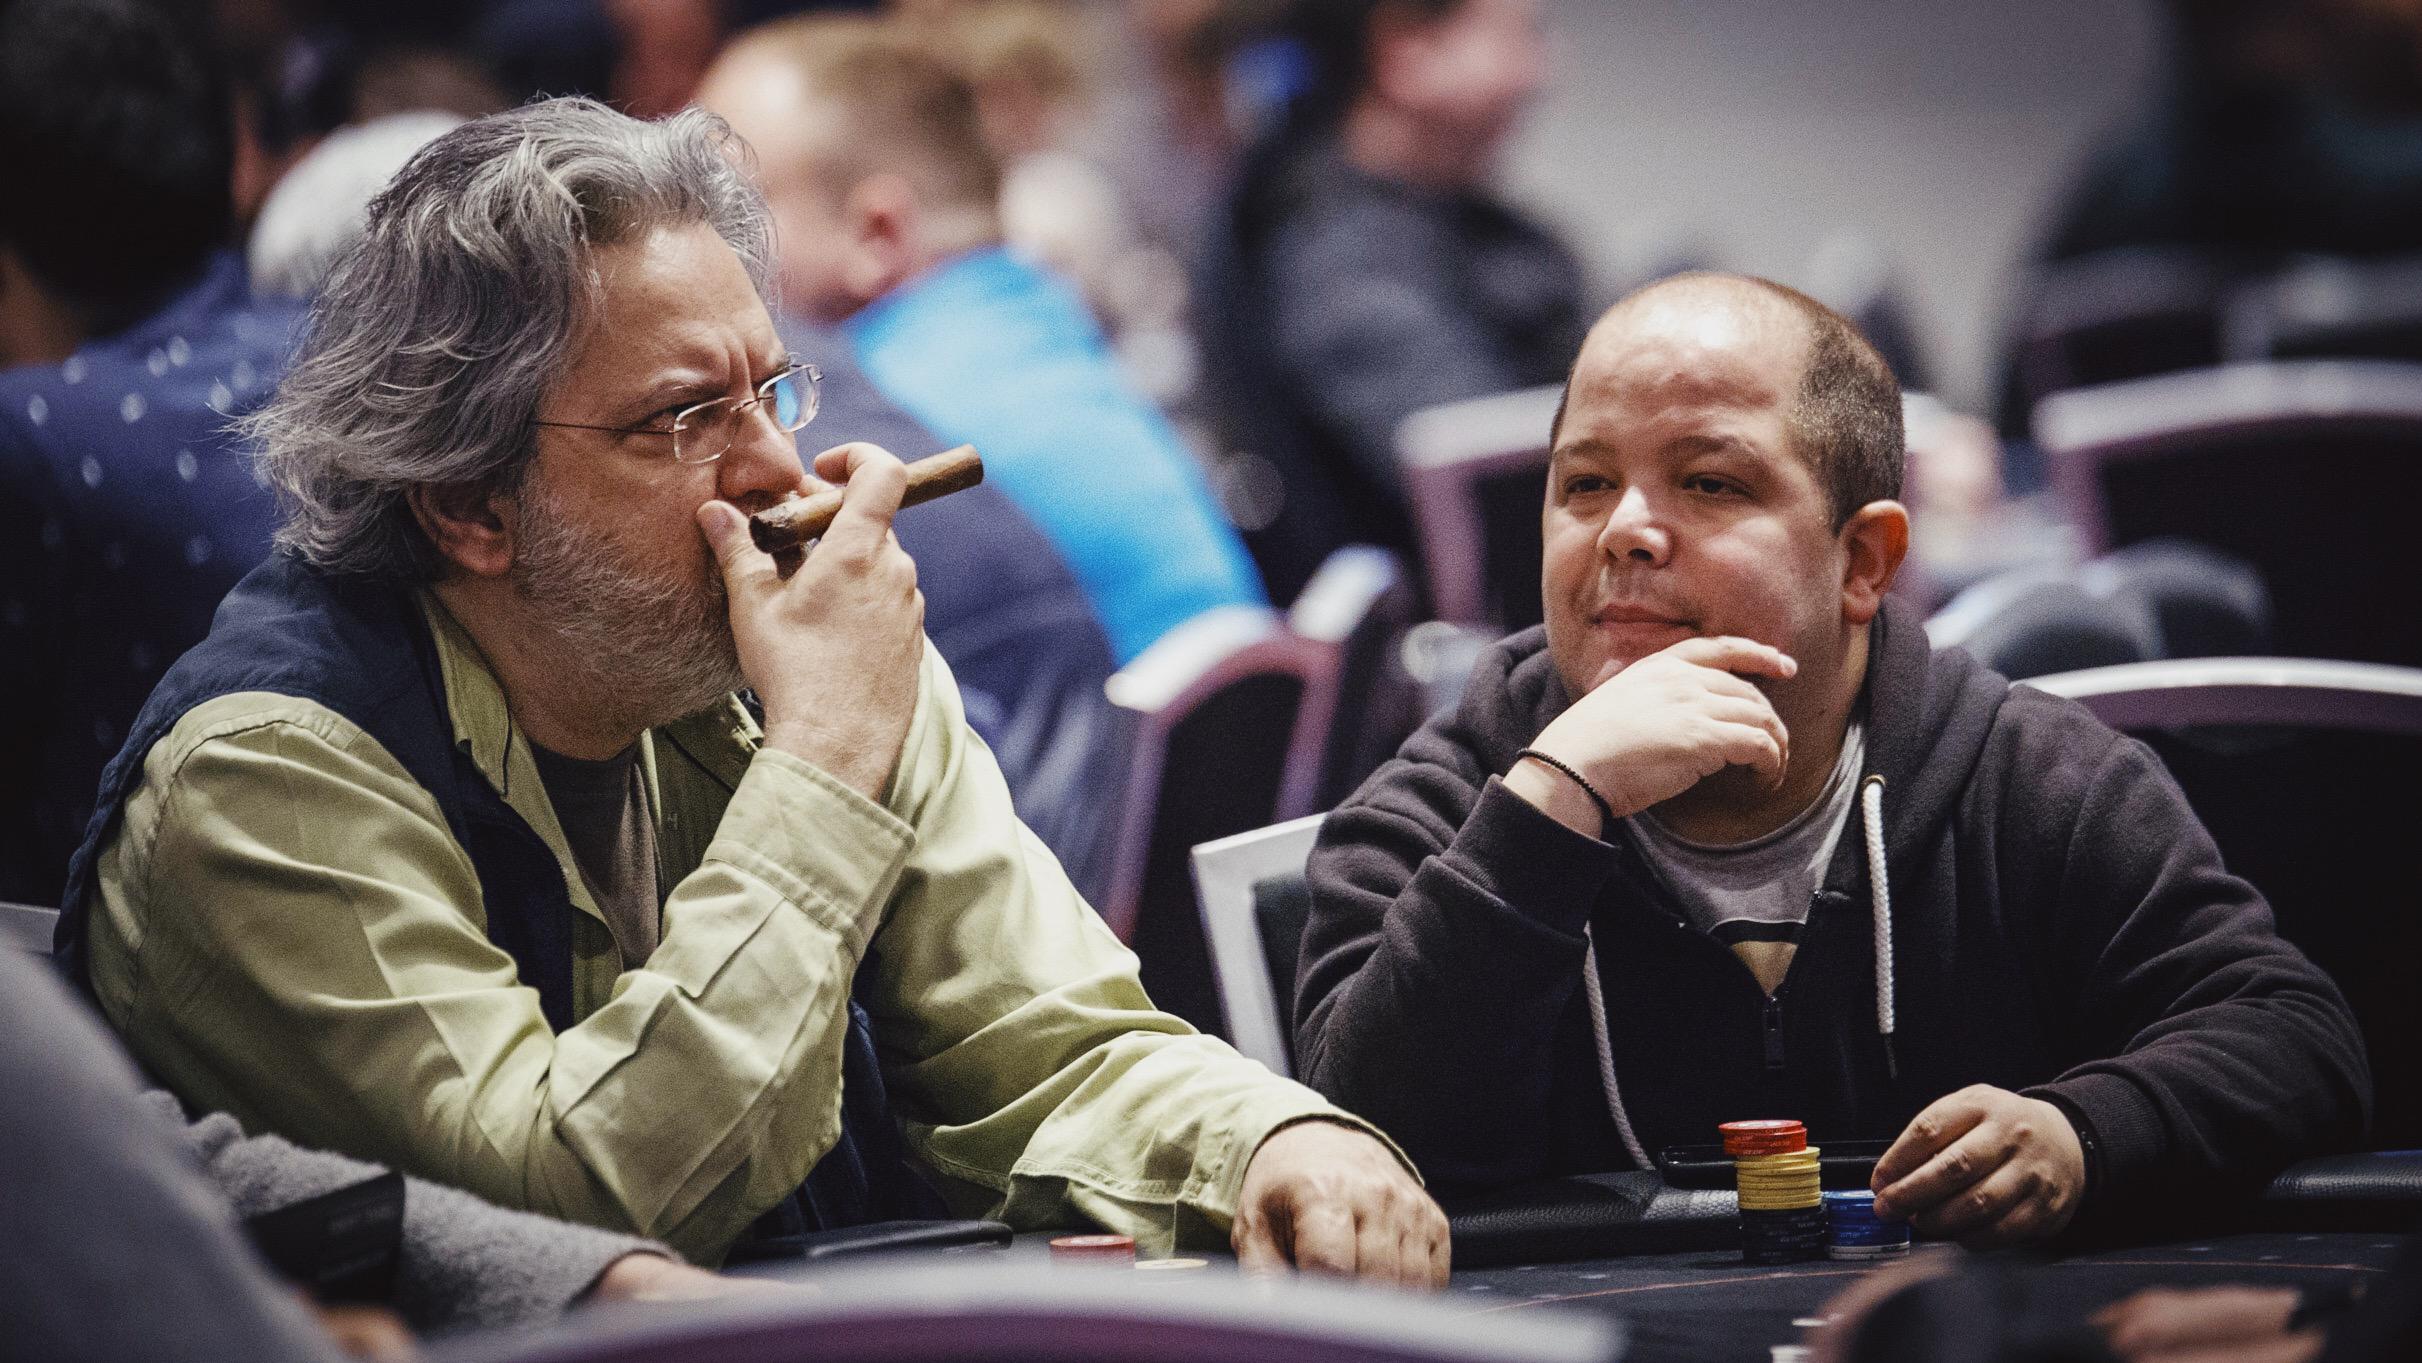 polina-shubkina-poker-004.JPG